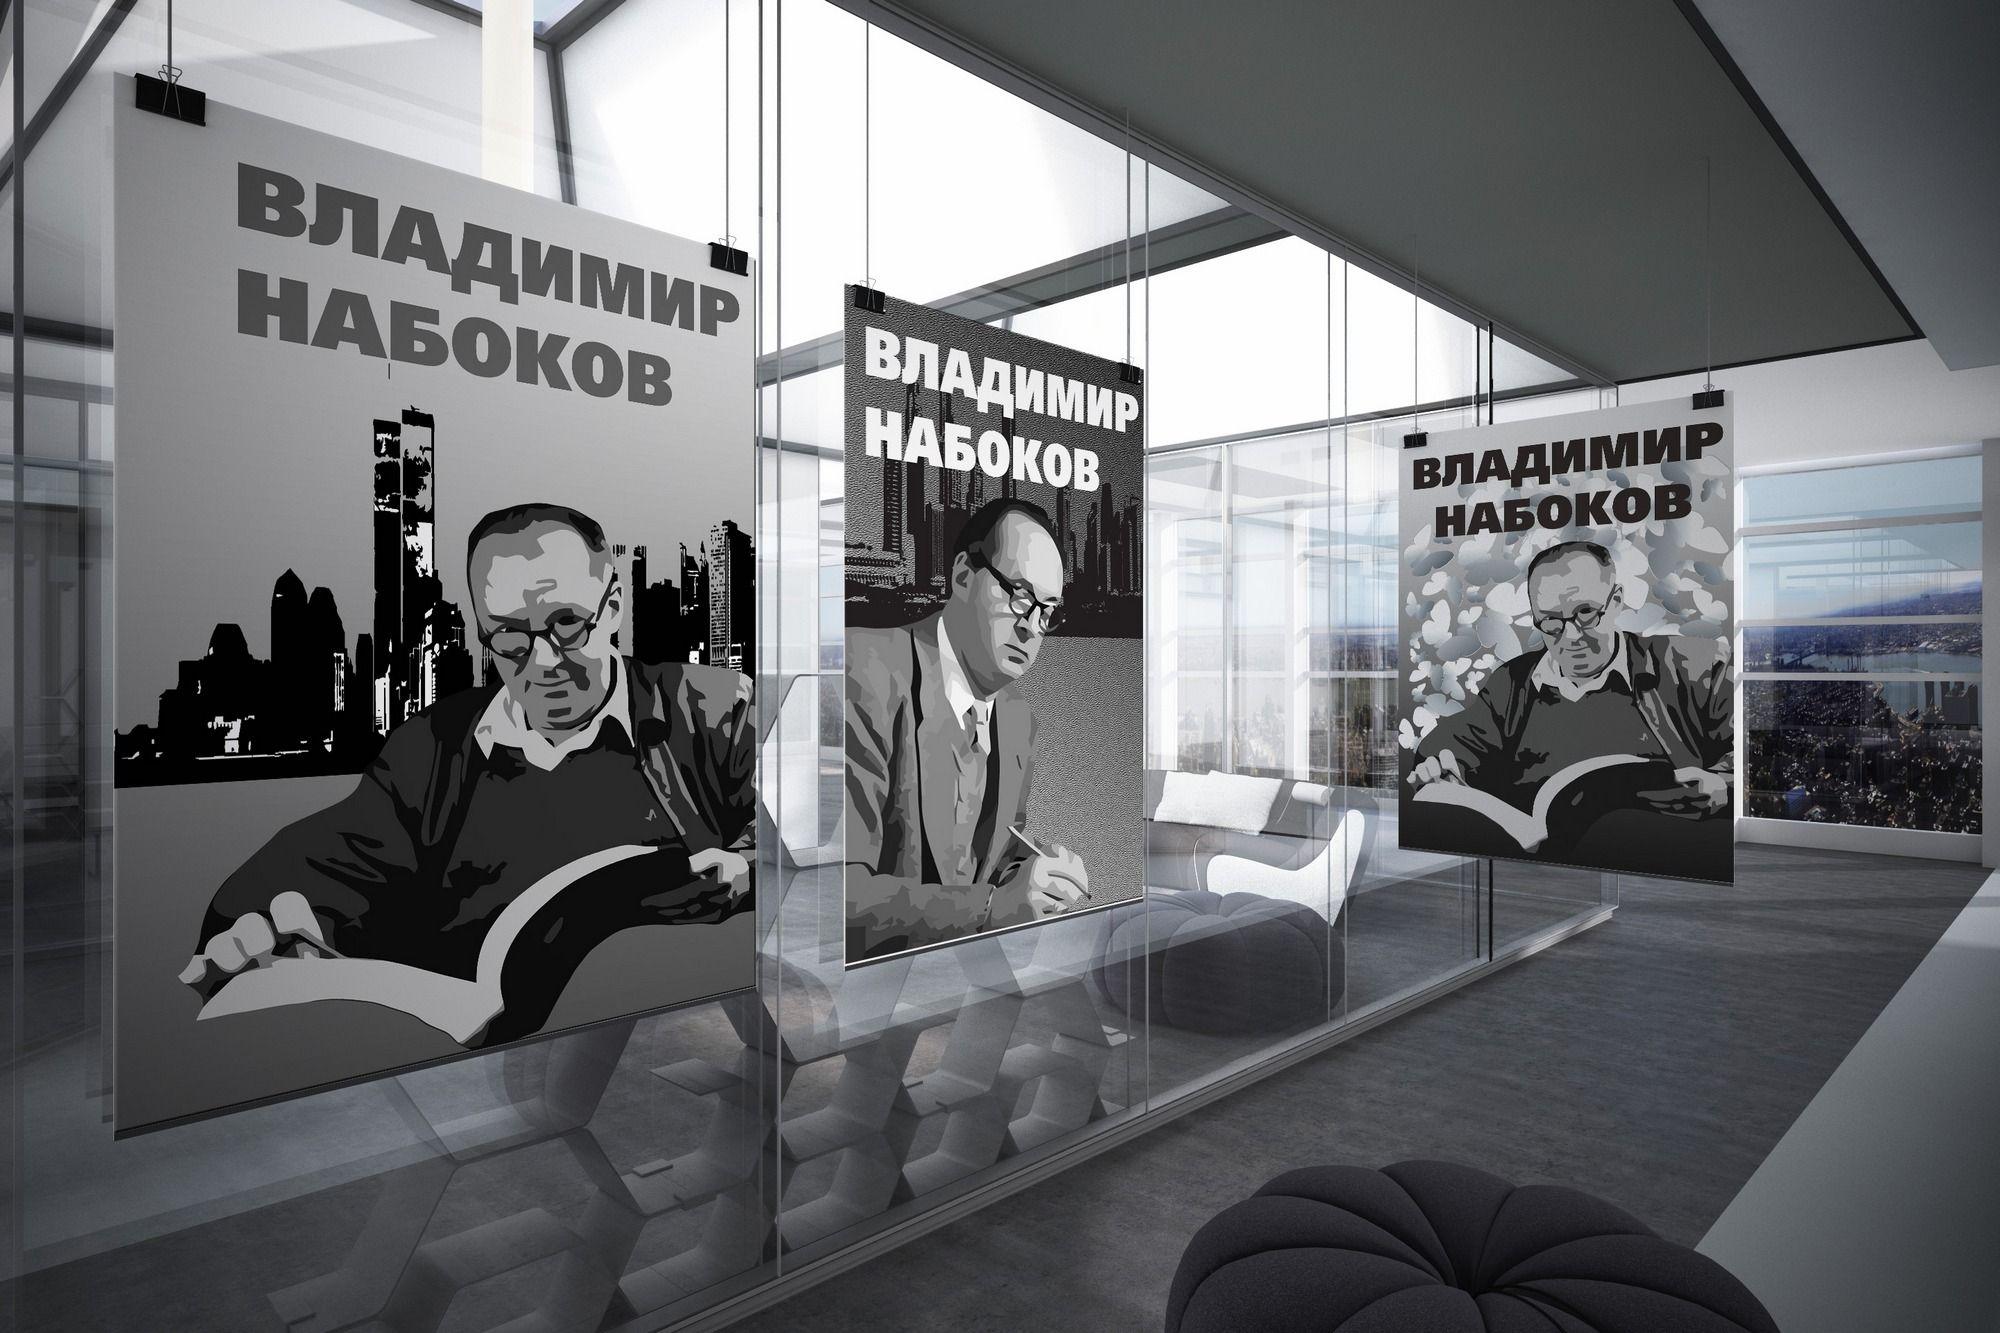 Плакат-портрет Владимира Набокова - дизайнер Silva